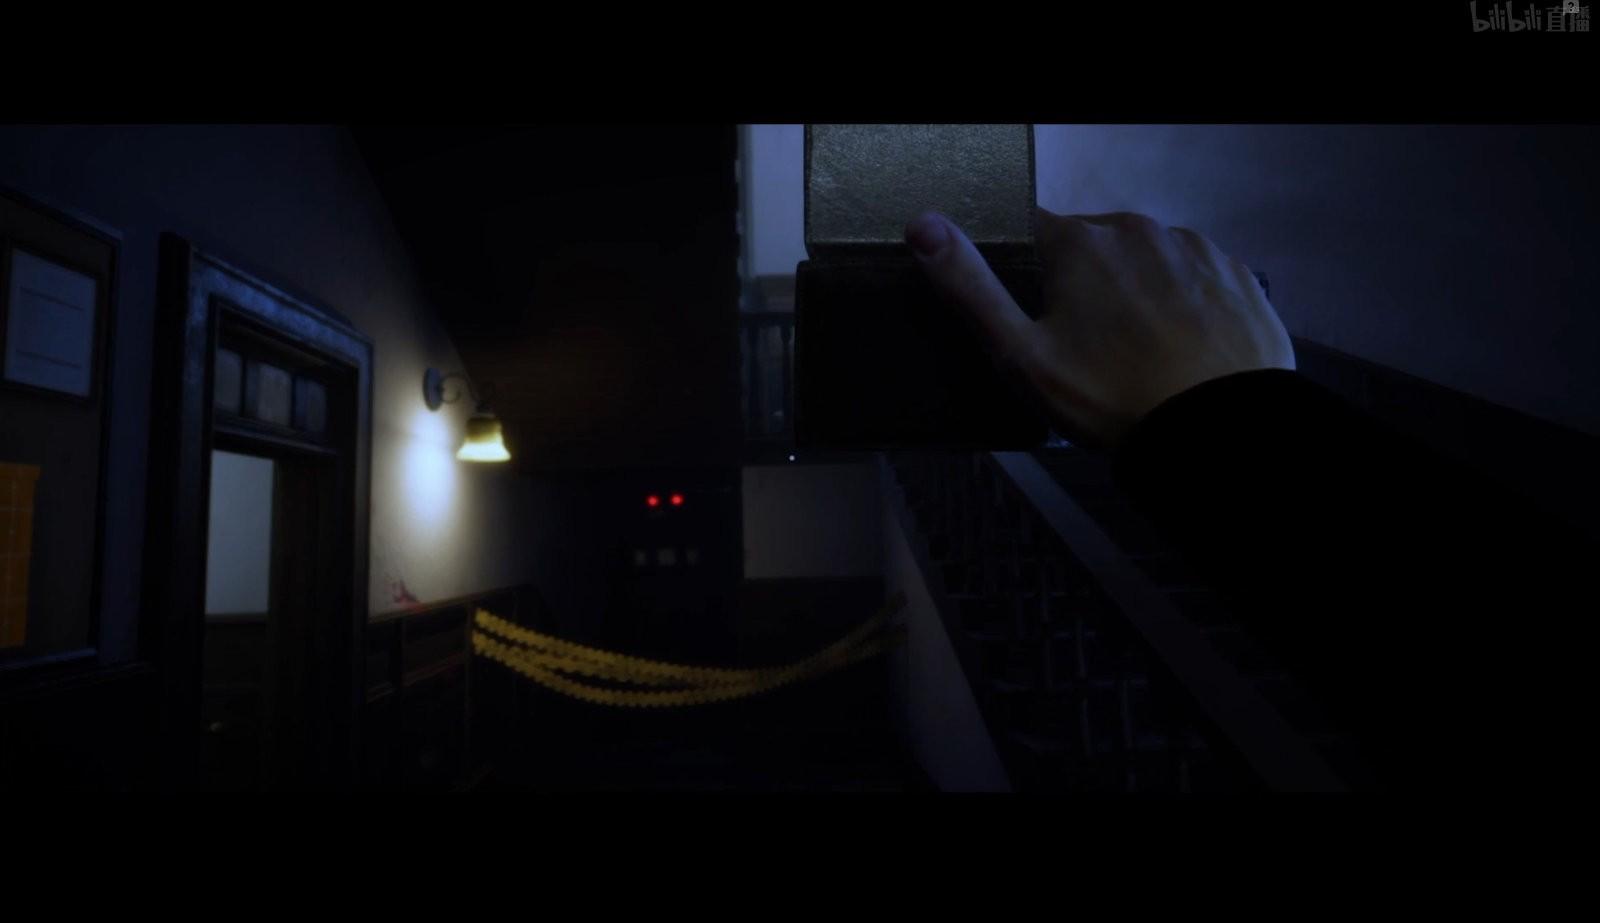 F5联合发布会:惊悚恐怖游戏《黑暗世界:因与果》公布